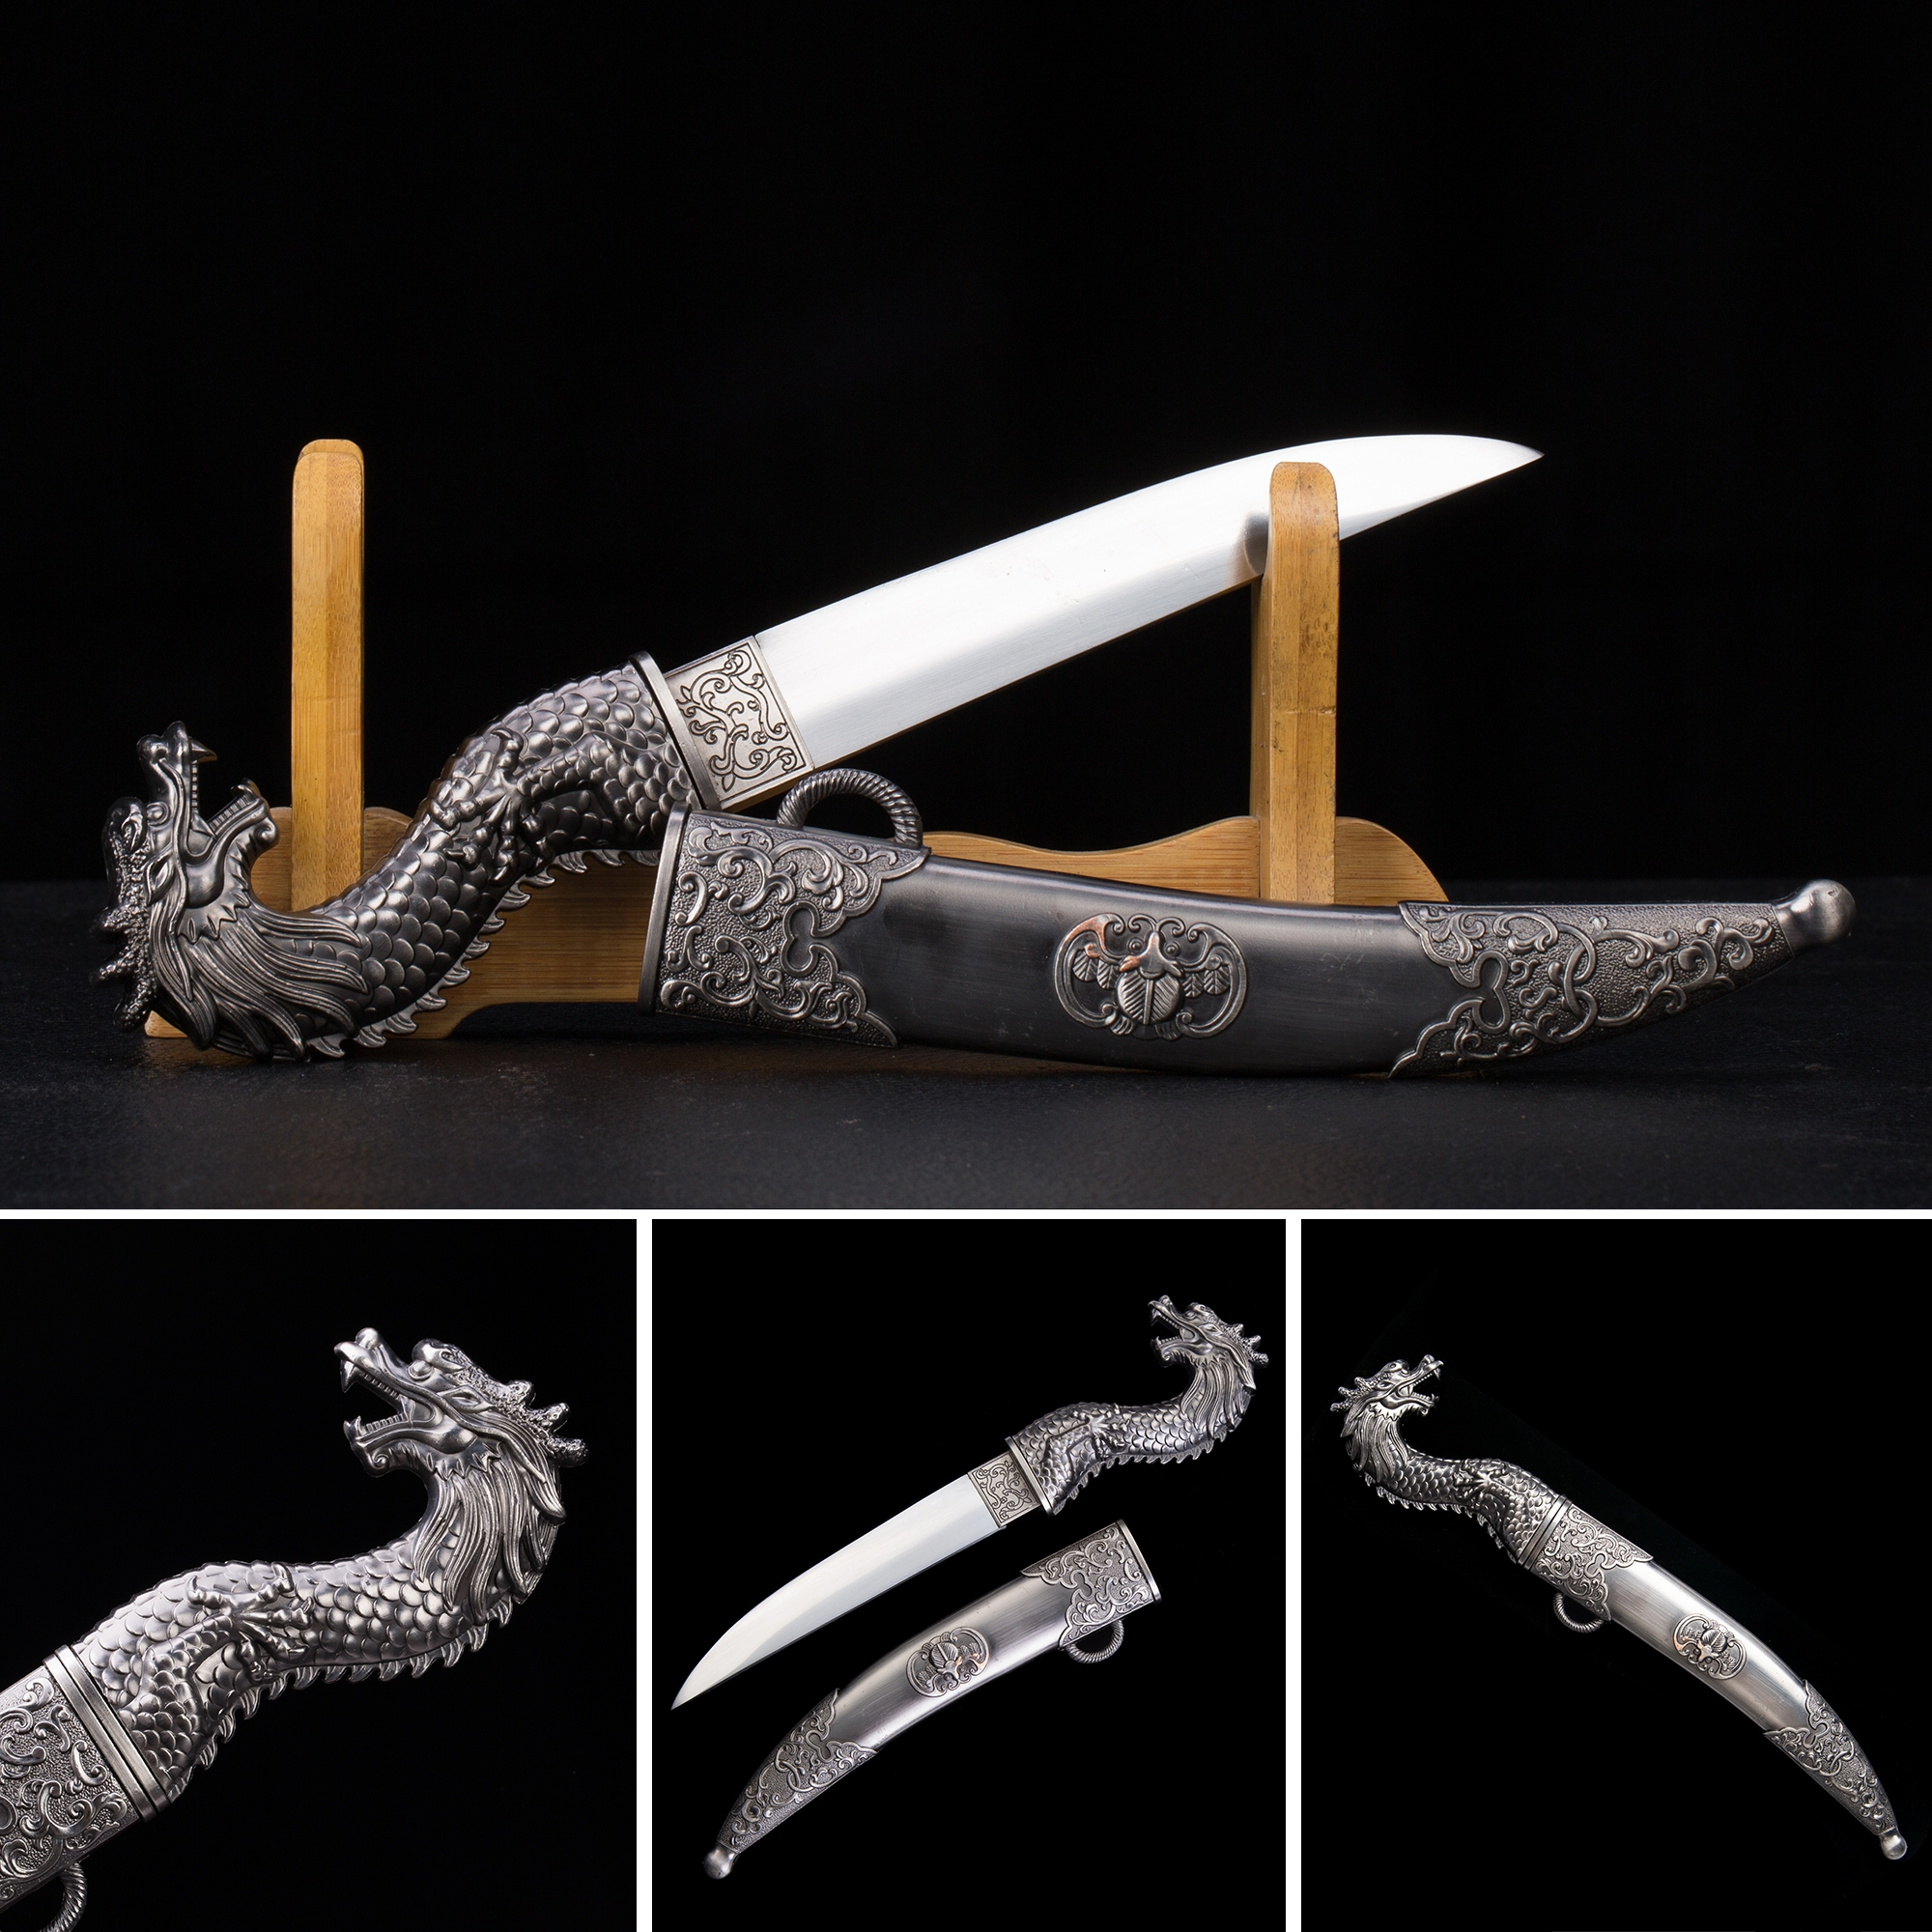 Handmade High Manganese Steel Gold Dragon Theme Short Japanese Aikuchi Pocket Tanto Knife